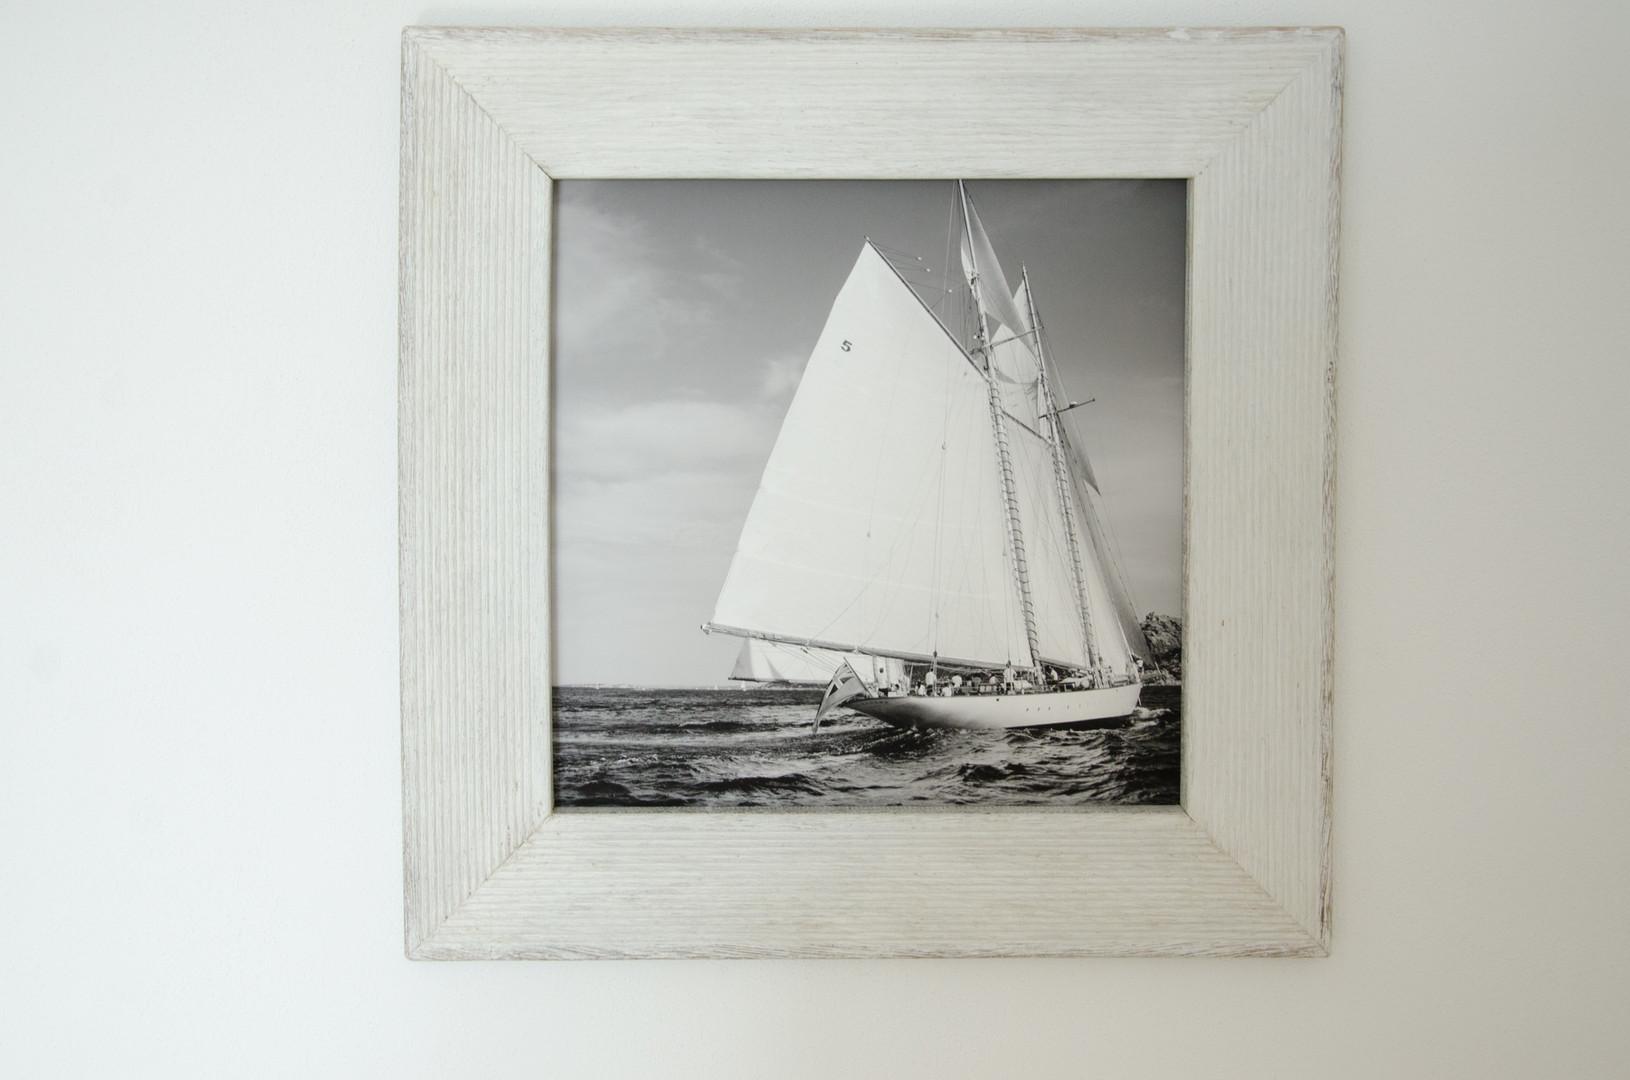 09 Seaside - Susanne Paetsch photo